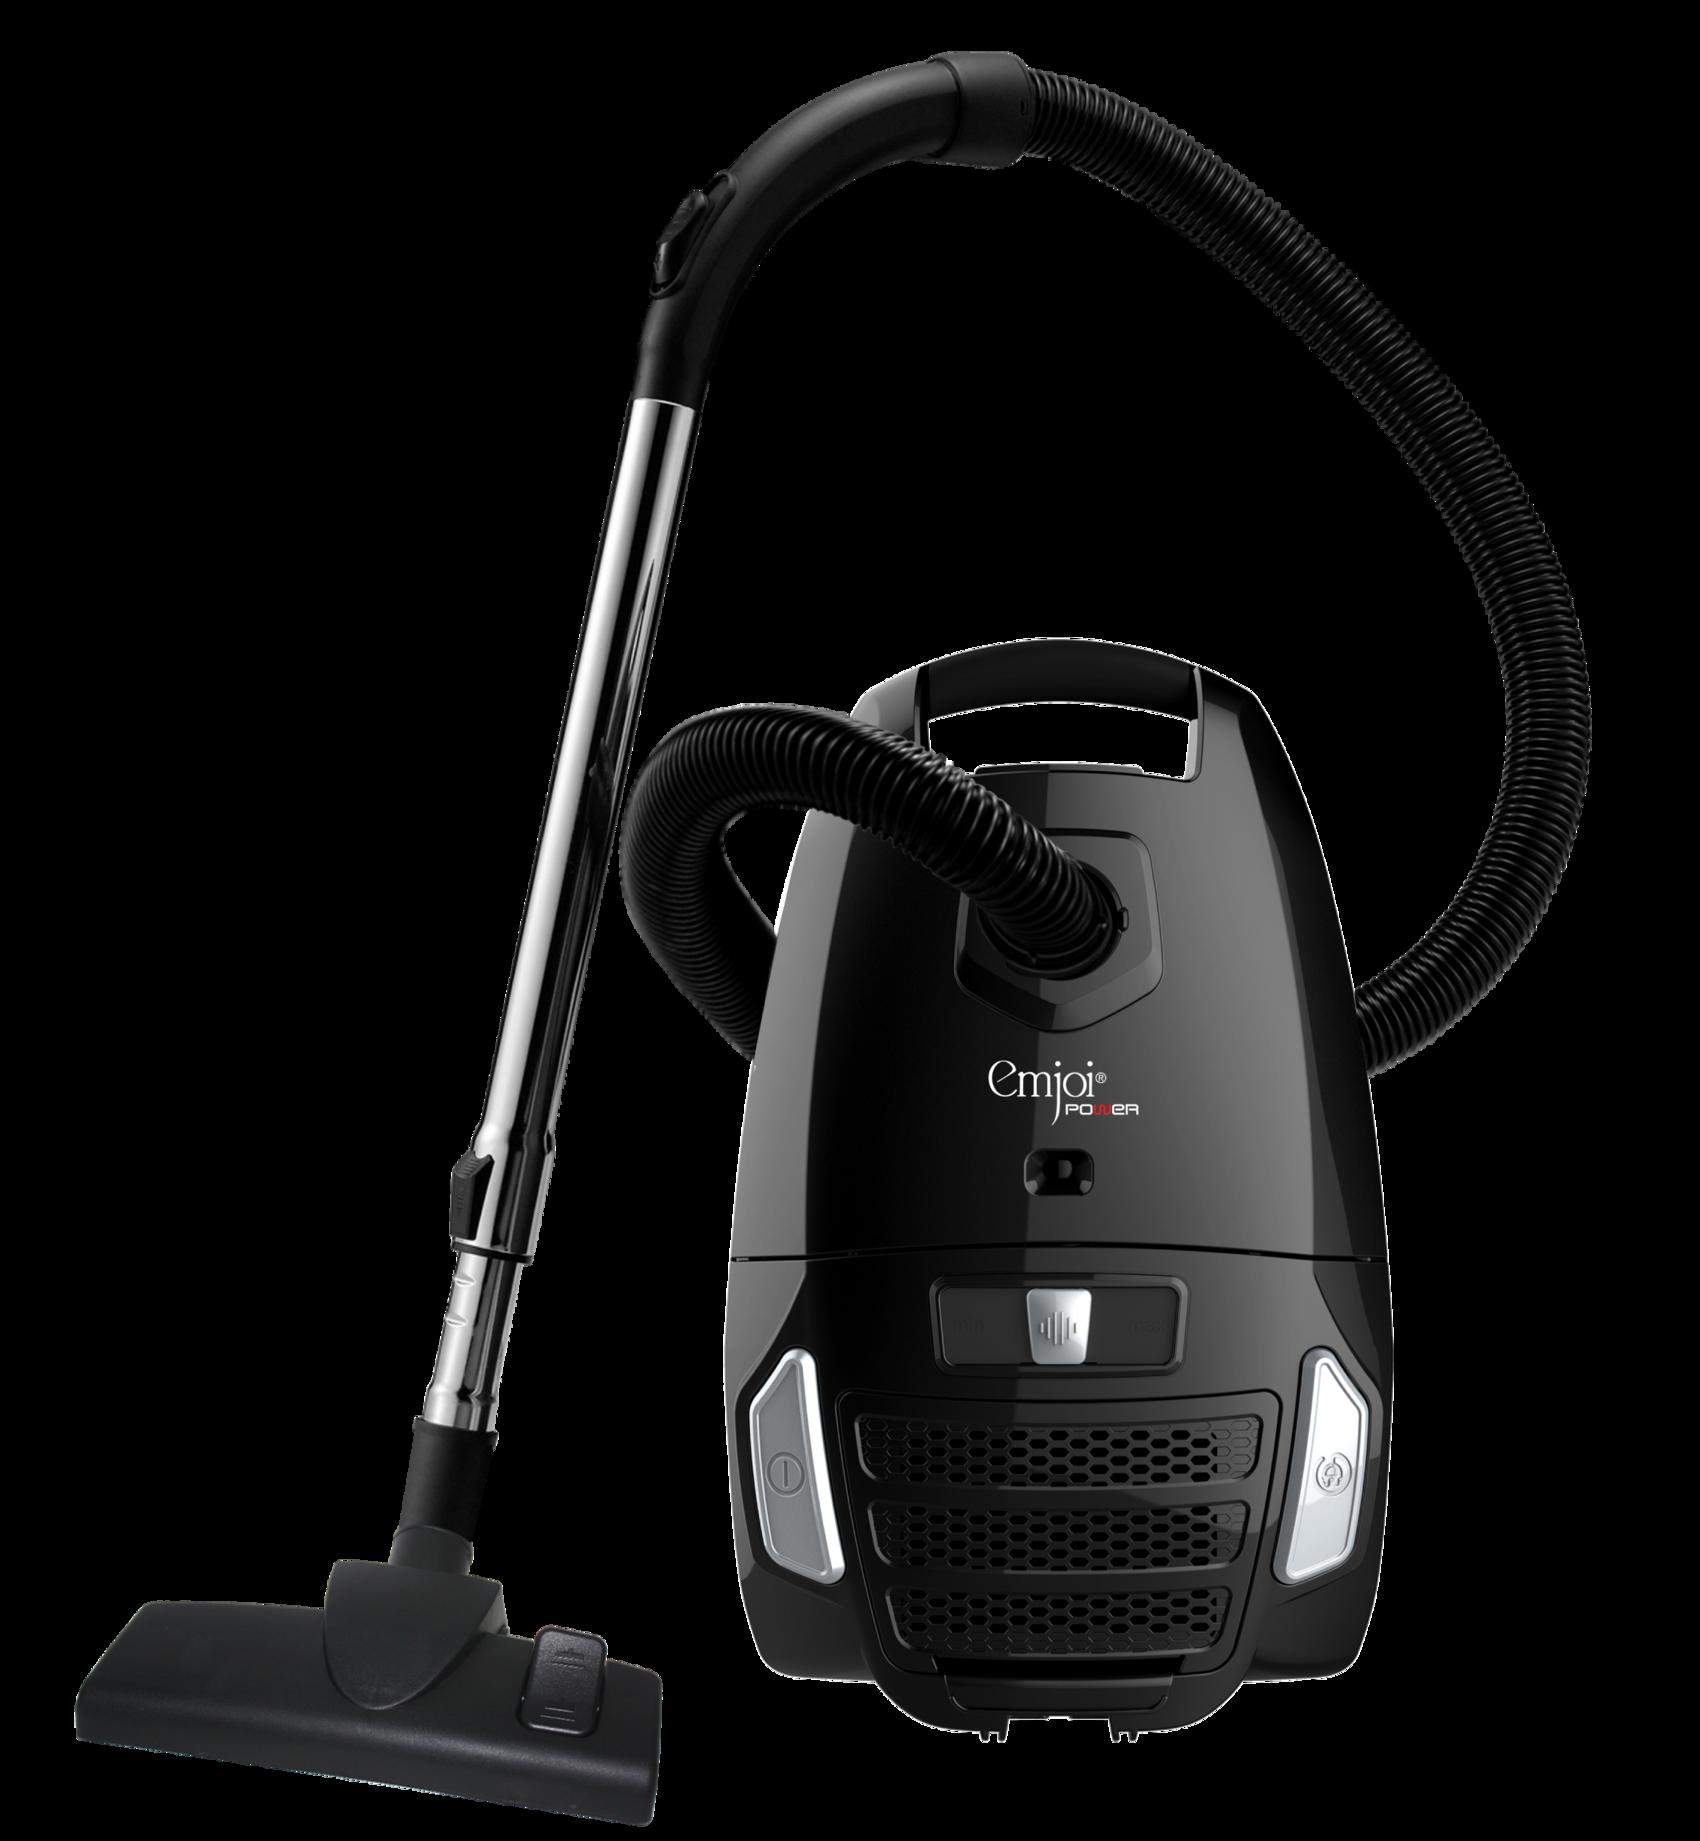 PNG images, PNGs, Vacuum, Vacuum cleaner, Hoover, Hoovers, (73).png.